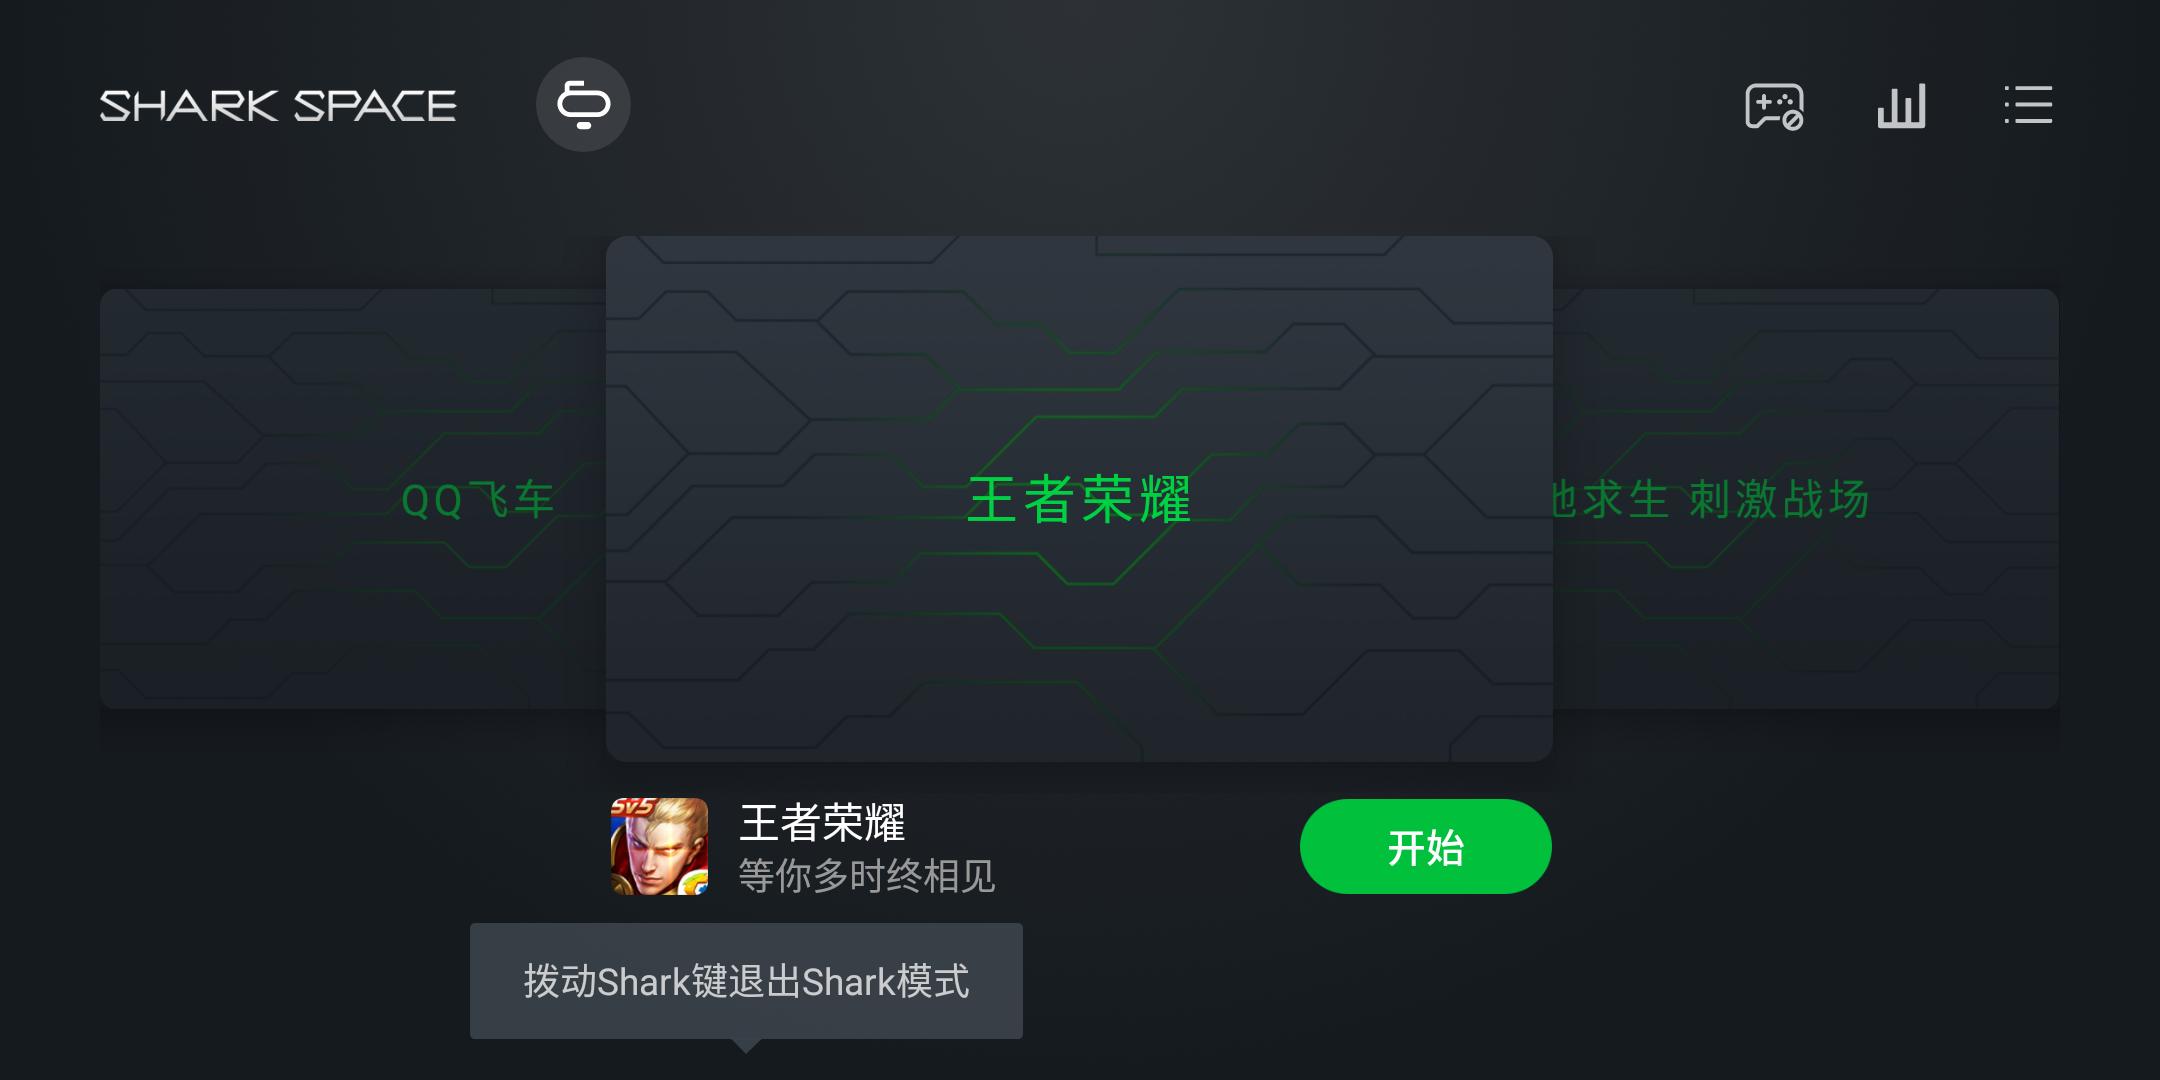 Screenshot_2018-04-27-12-23-08-834_com.blackshark.png